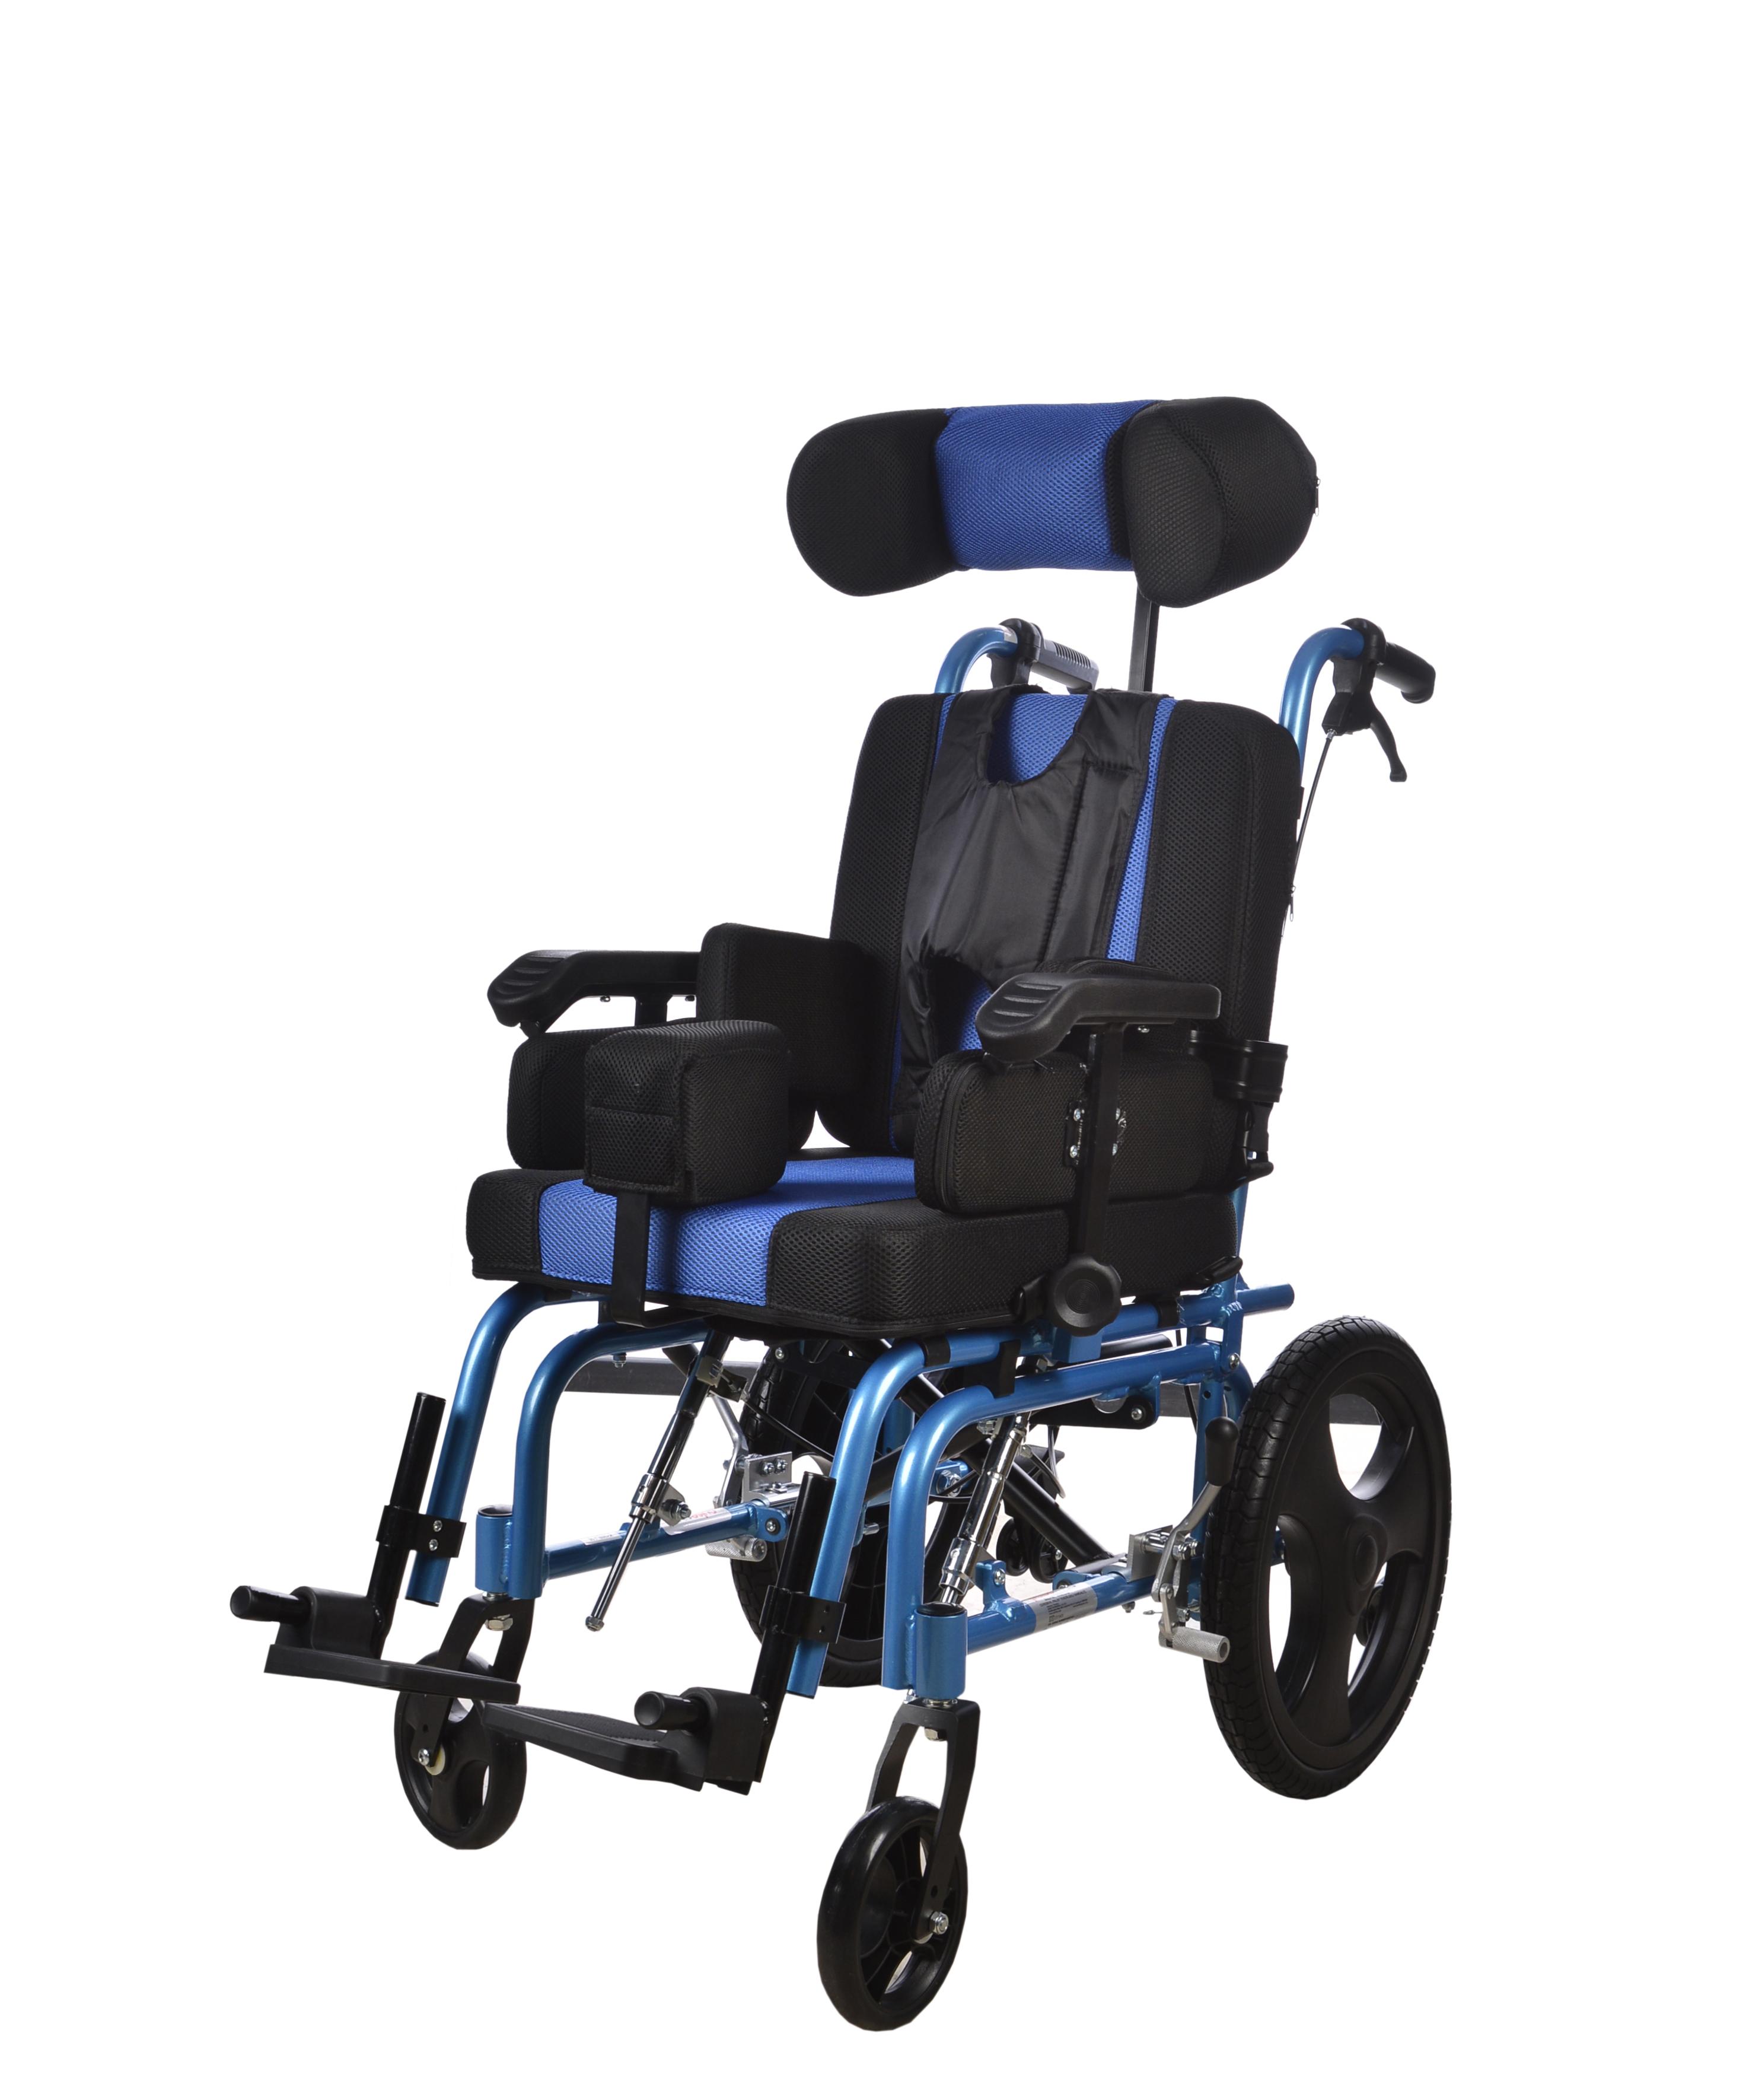 Pulsemed Serebral Tekerlekli Sandalye KY958LC-A-46